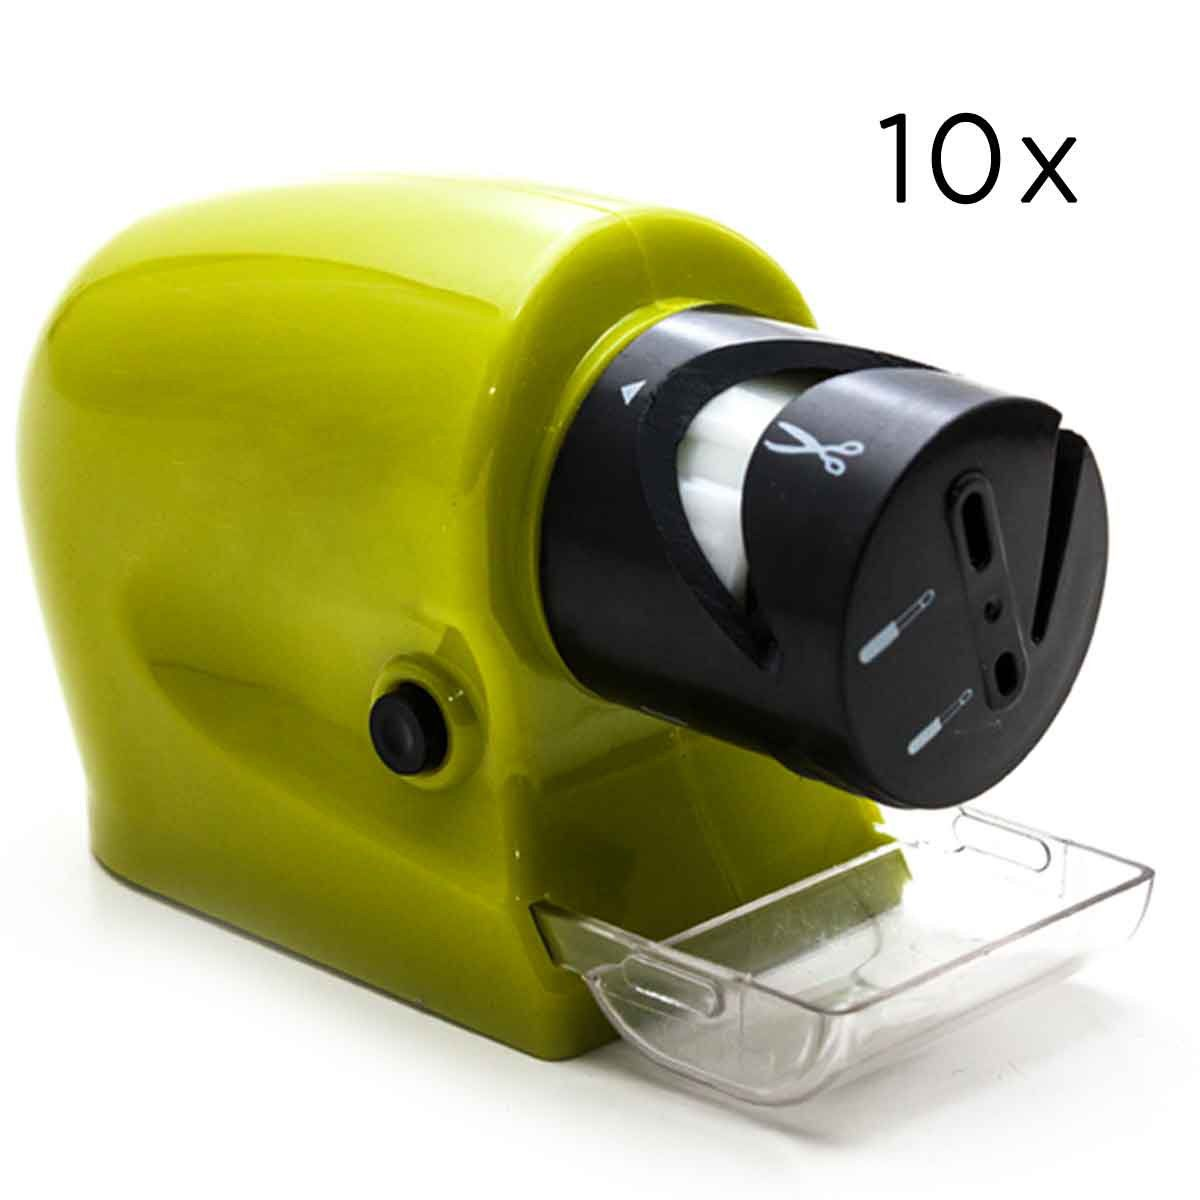 Kit 10 Amolador Afiador Portátil Tesouras Facas Ferramentas Alicate